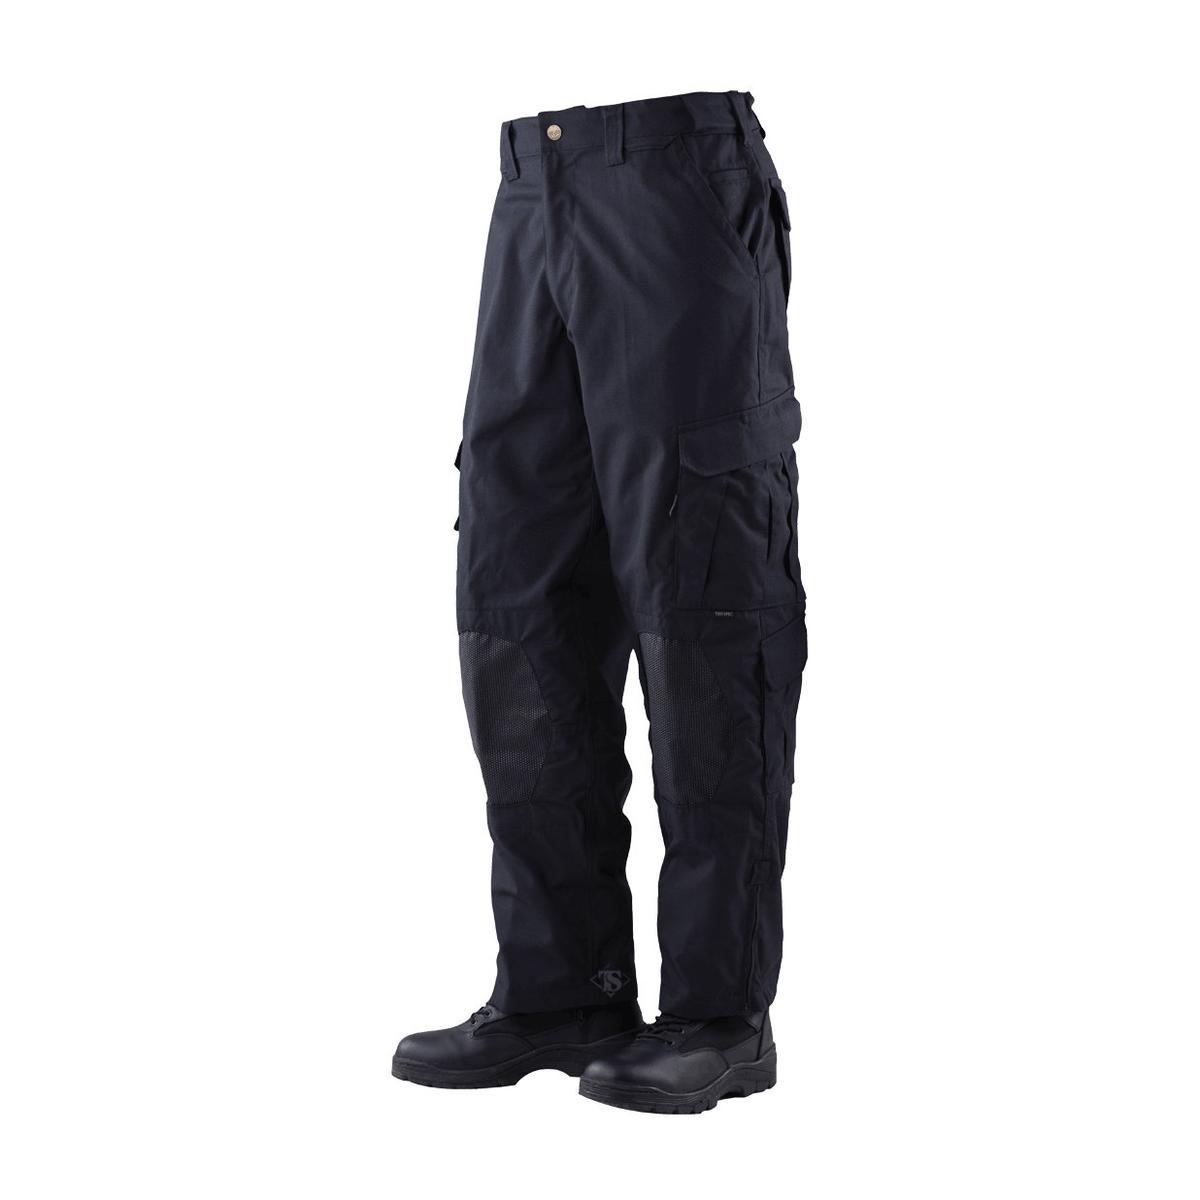 Tru-Spec 1246 Mens TRU Xtreme Pants NYCO Rip-Stop Black